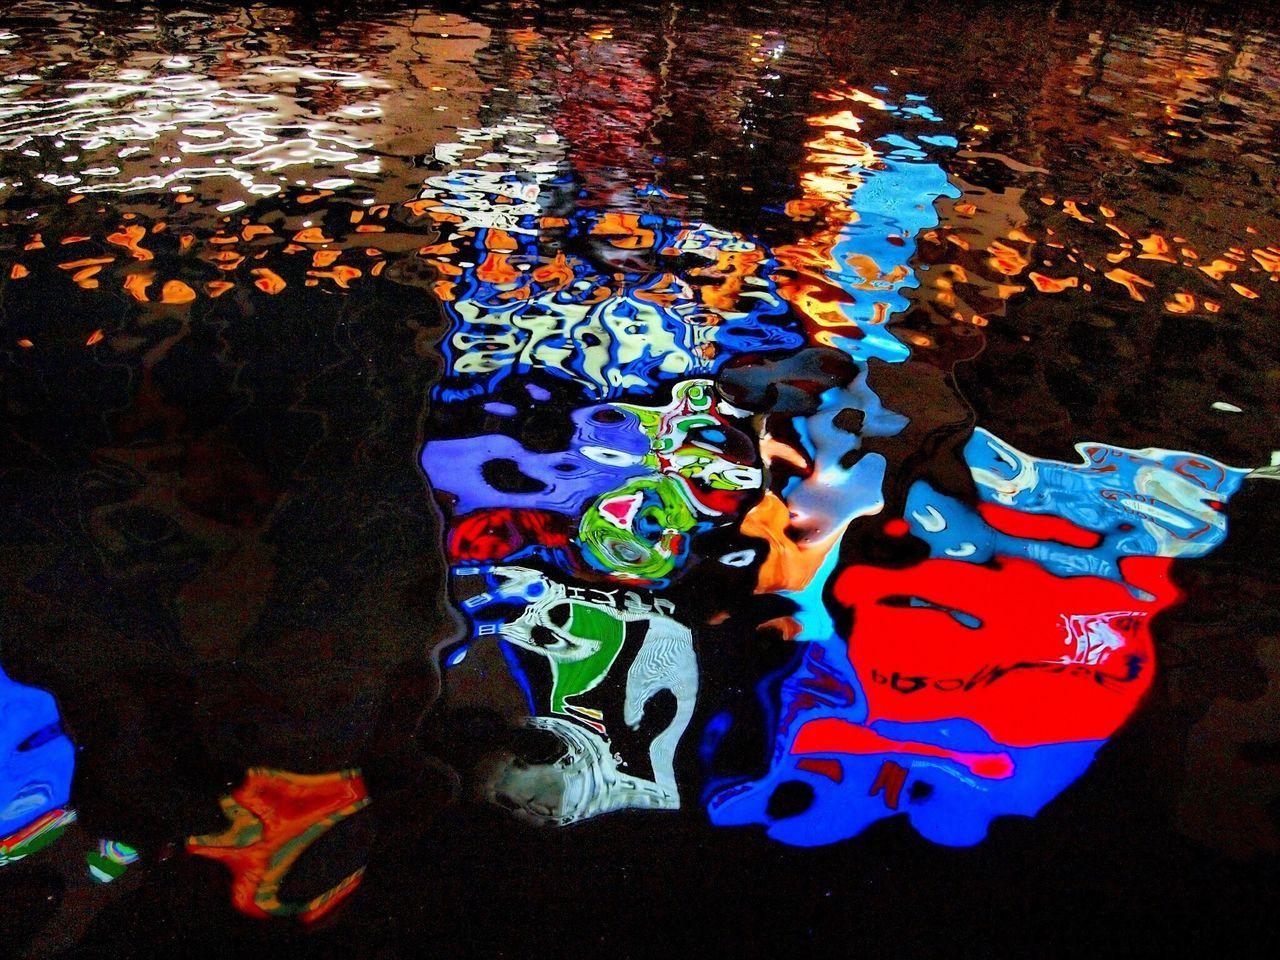 Time To Reflect the colorful neon of Ōsaka and lanterns reflecting on the Dōtonbori river (#1). Shinsaibashi, Ōsaka; Japan. 2014/08/31. OLYMPUS PEN Lite E-PL1. Water Reflections Neon Traveling